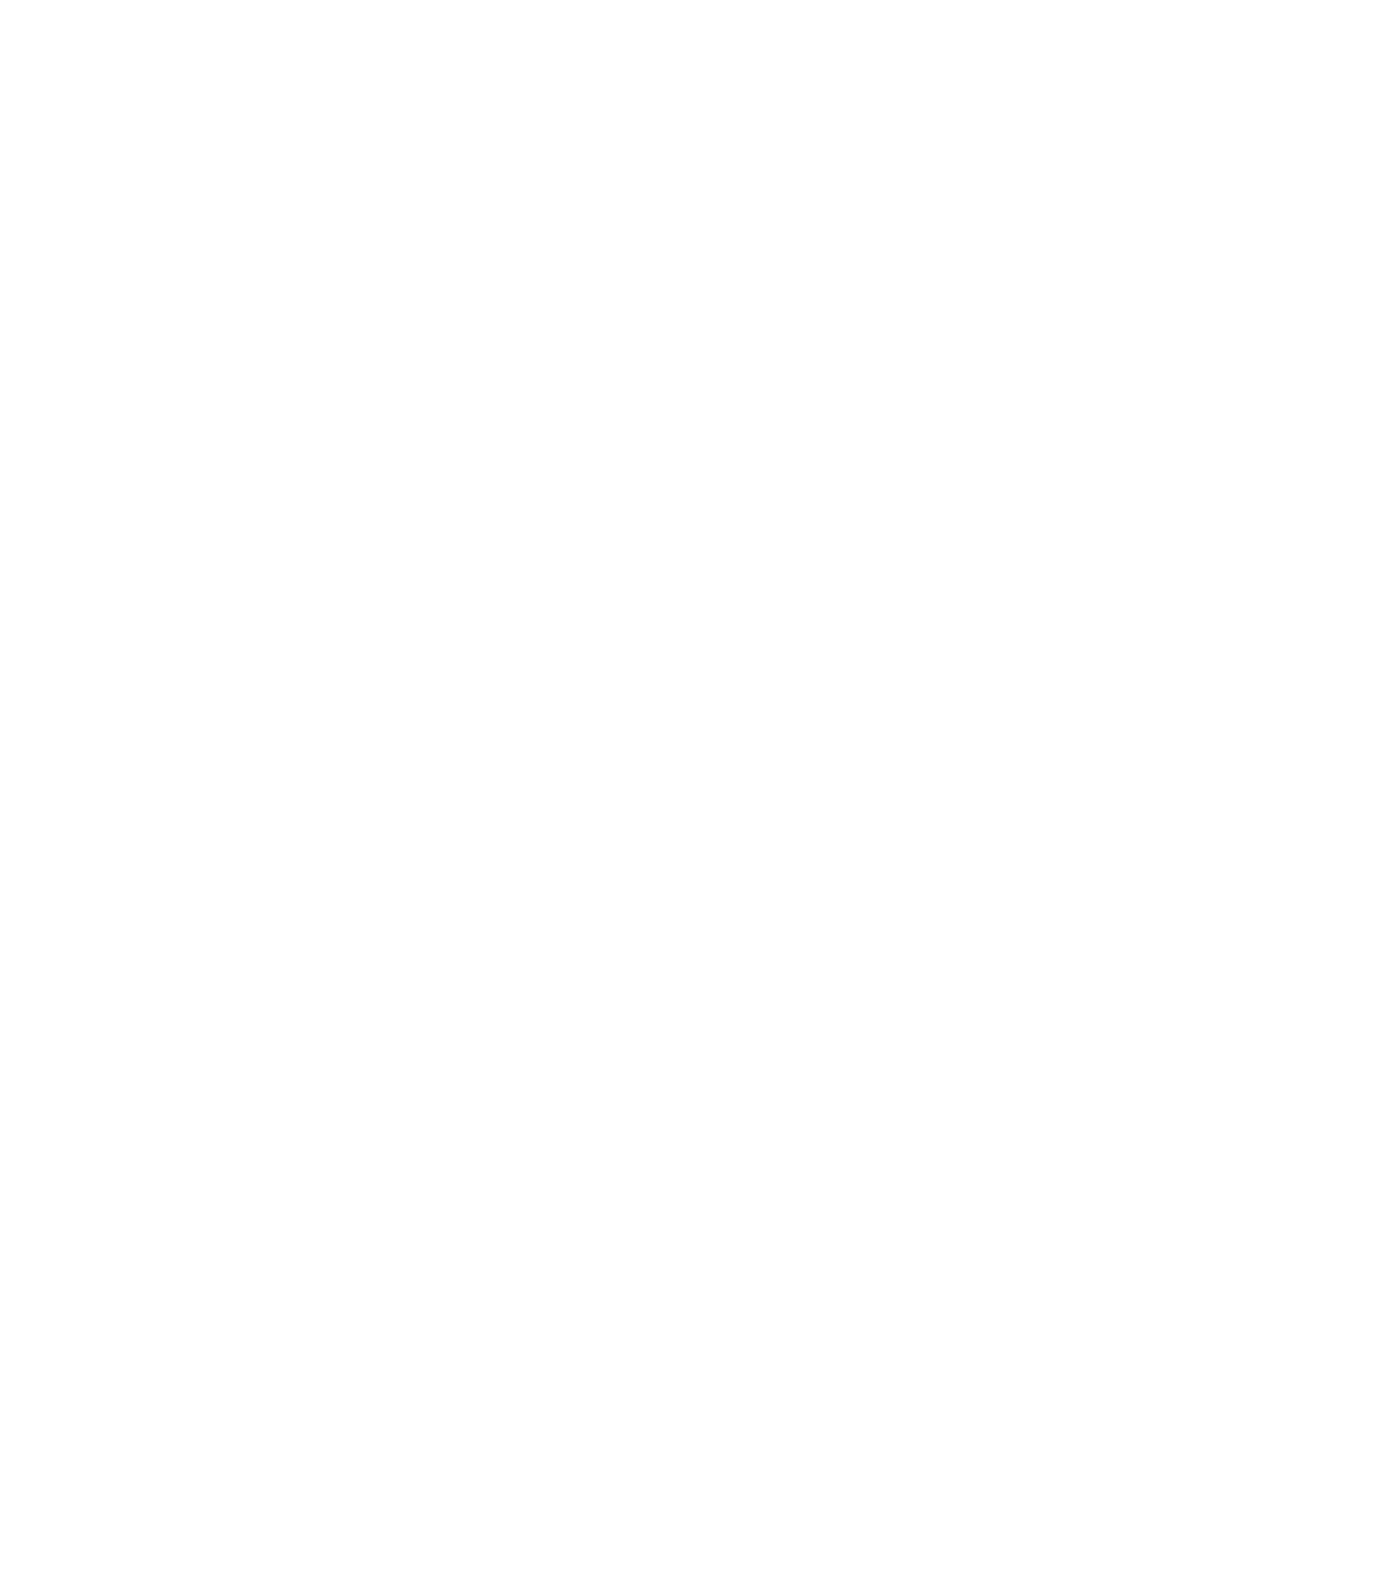 lolifantparis_bonhomme_blanc-1